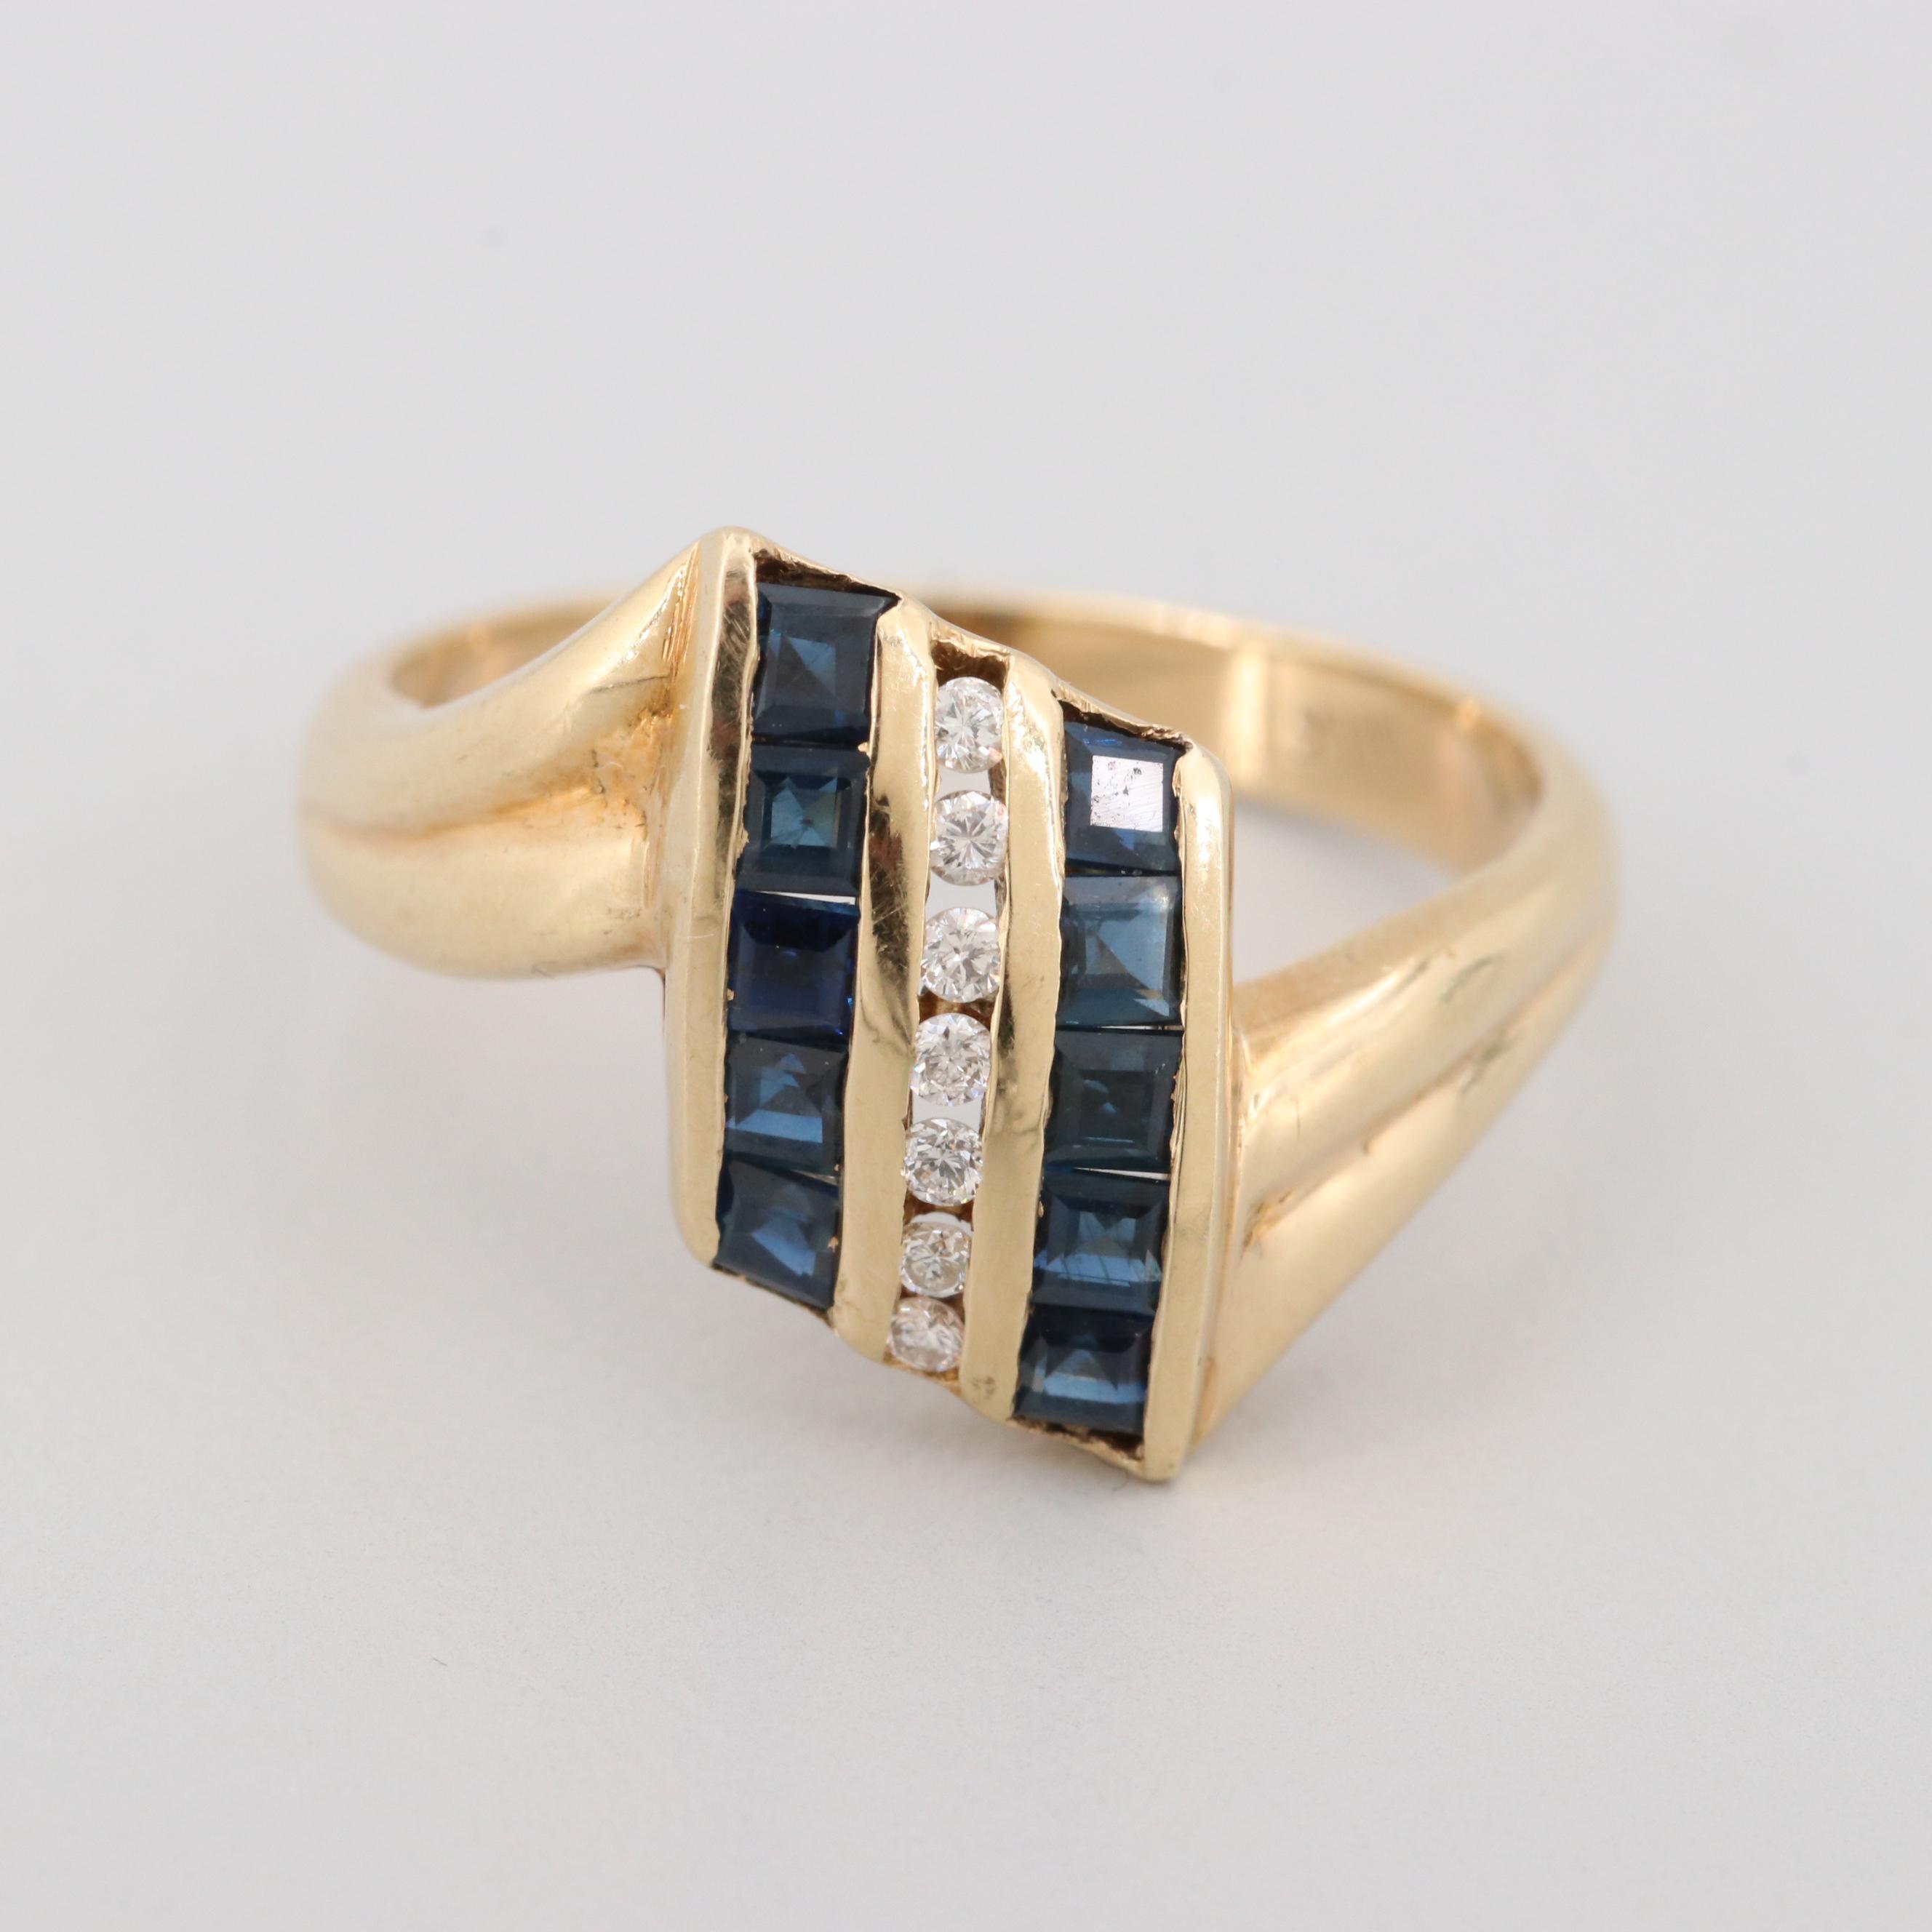 14K Yellow Gold Diamond and Blue Sapphire Ring